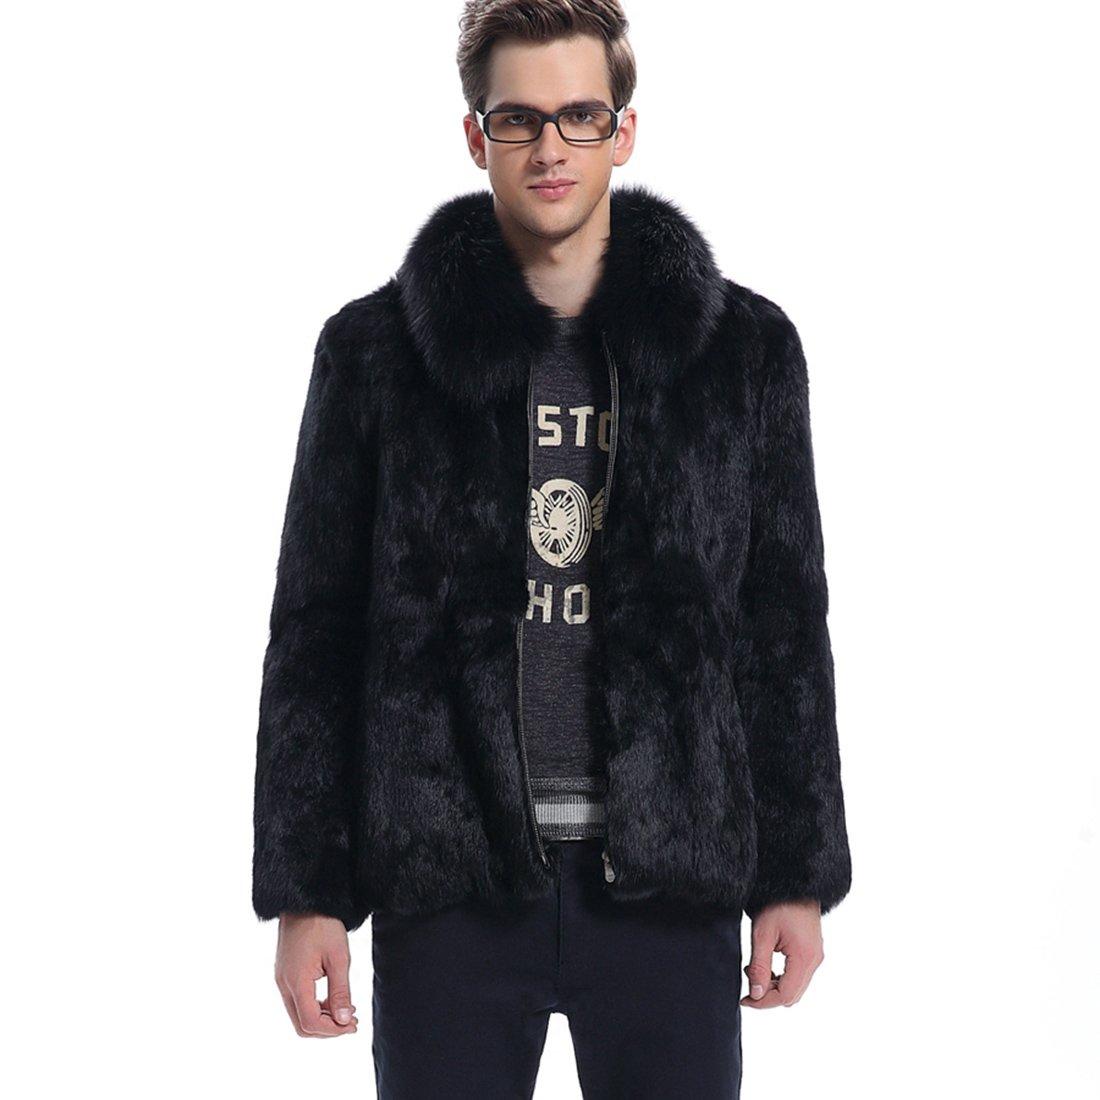 ManyFurs Men's fur coat top rabbit fur male genuine fur jacket whole rabbit fur